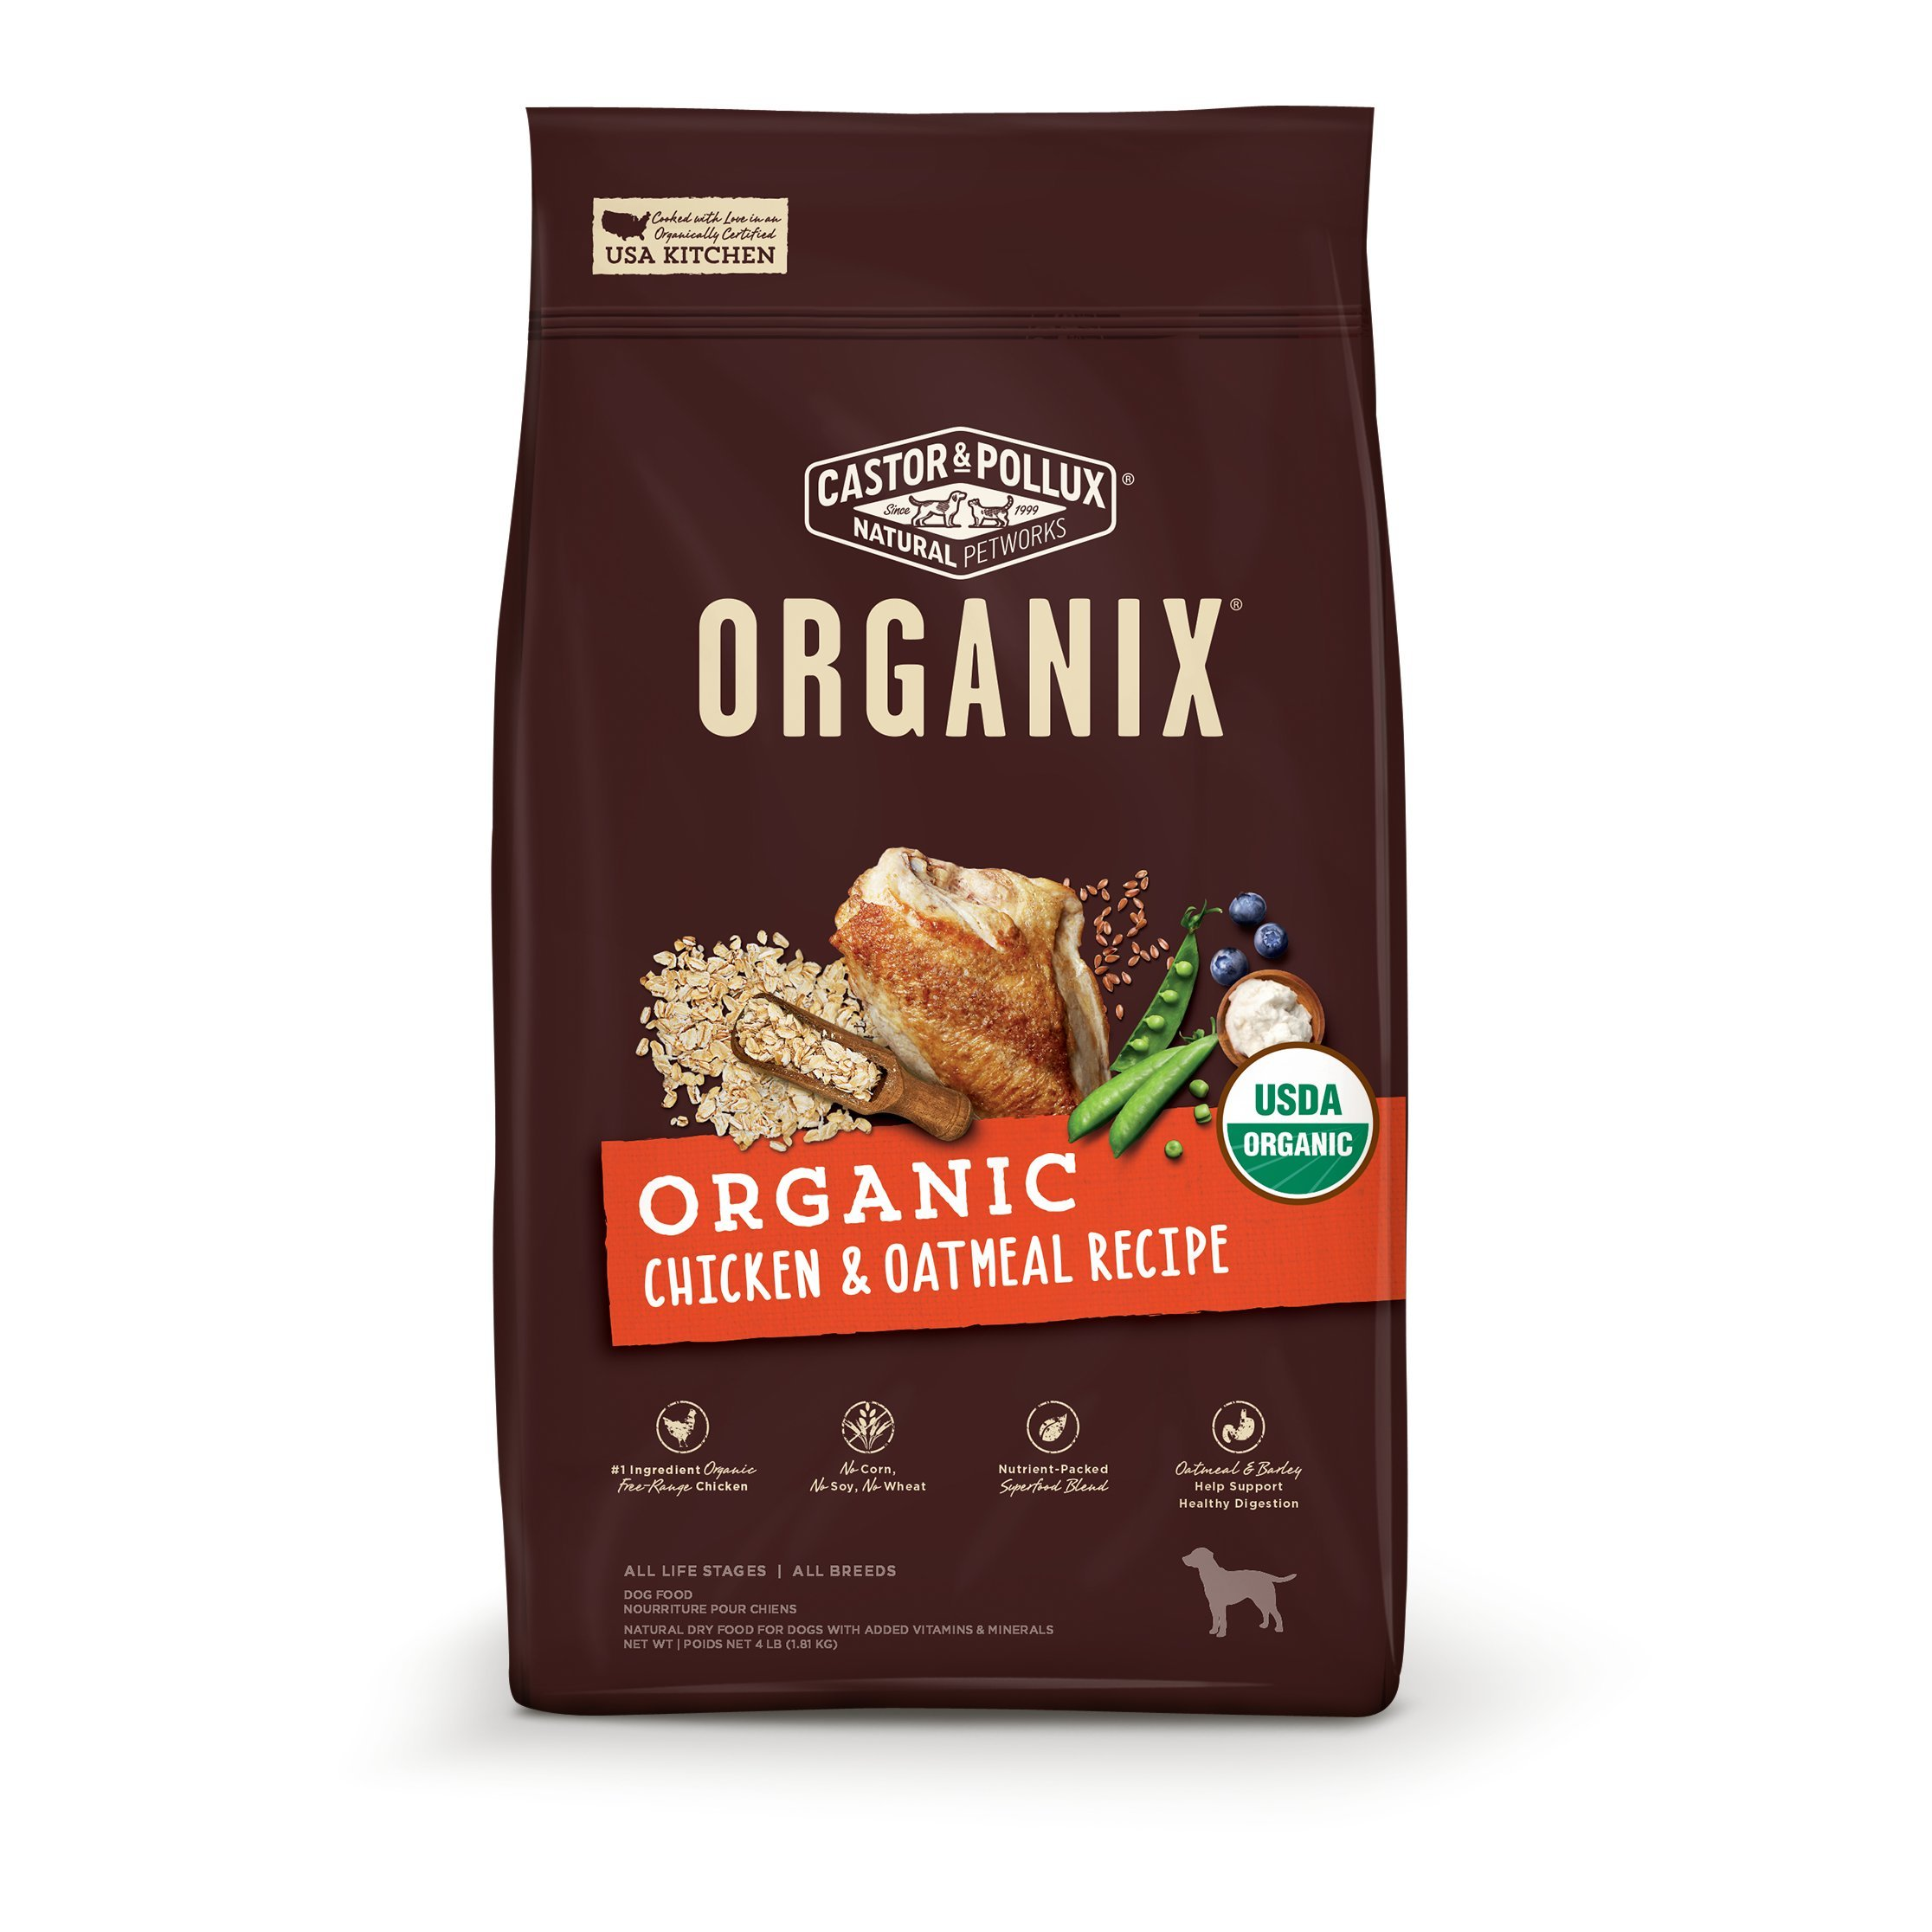 Castor & Pollux Organix Organic Chicken & Oatmeal Recipe Dry Dog Food 18Lb